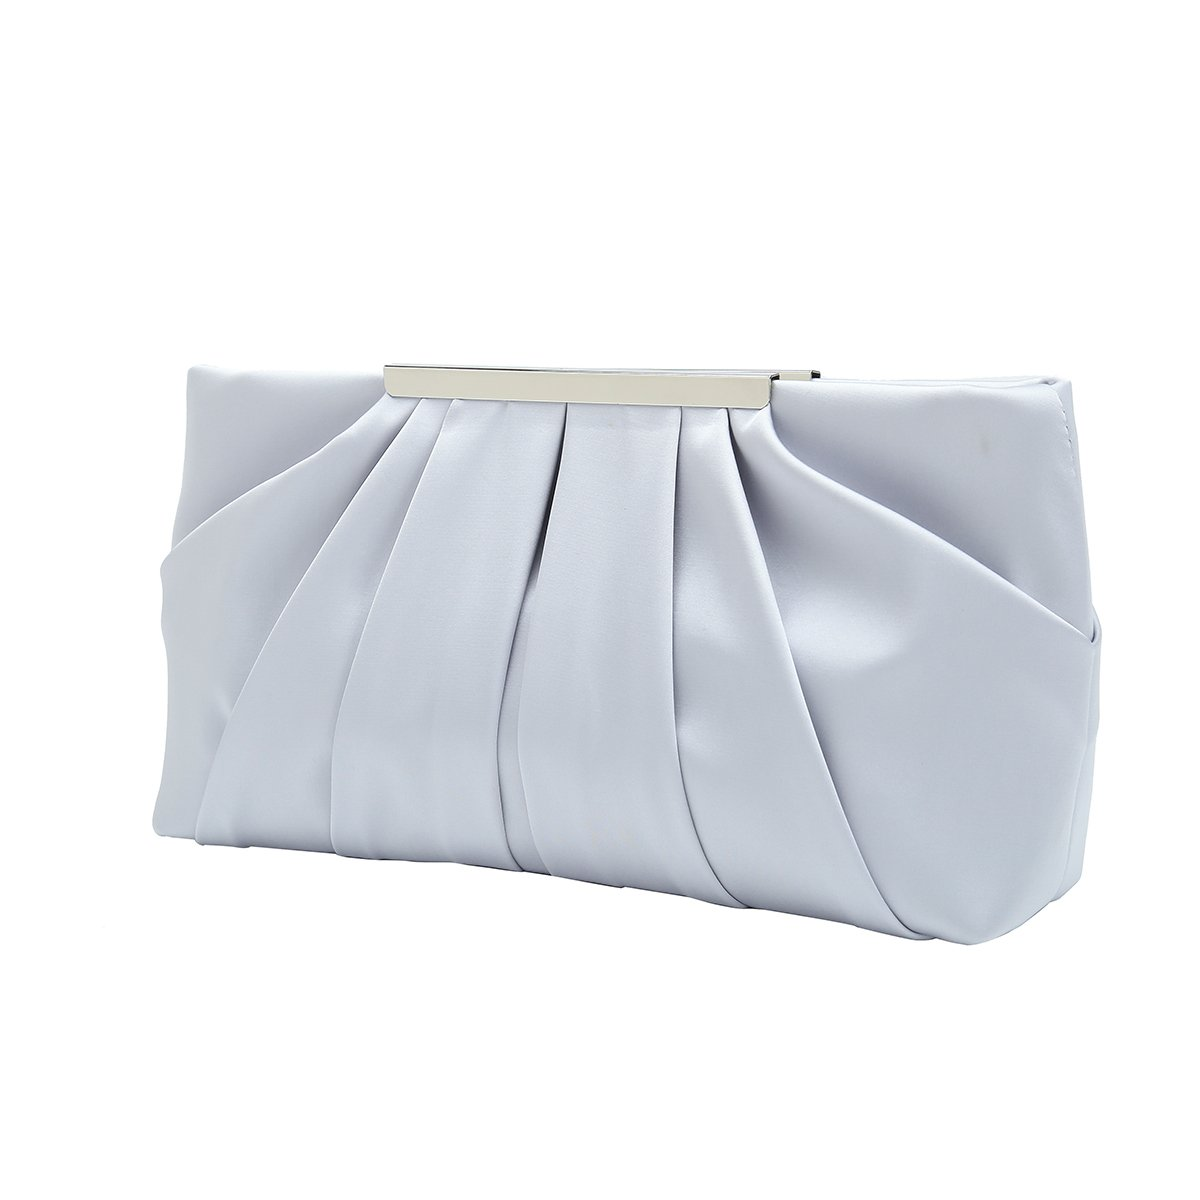 Charming Tailor Clutch Evening Bag Elegant Pleated Satin Formal Handbag Simple Classy Purse for Women (Silver)